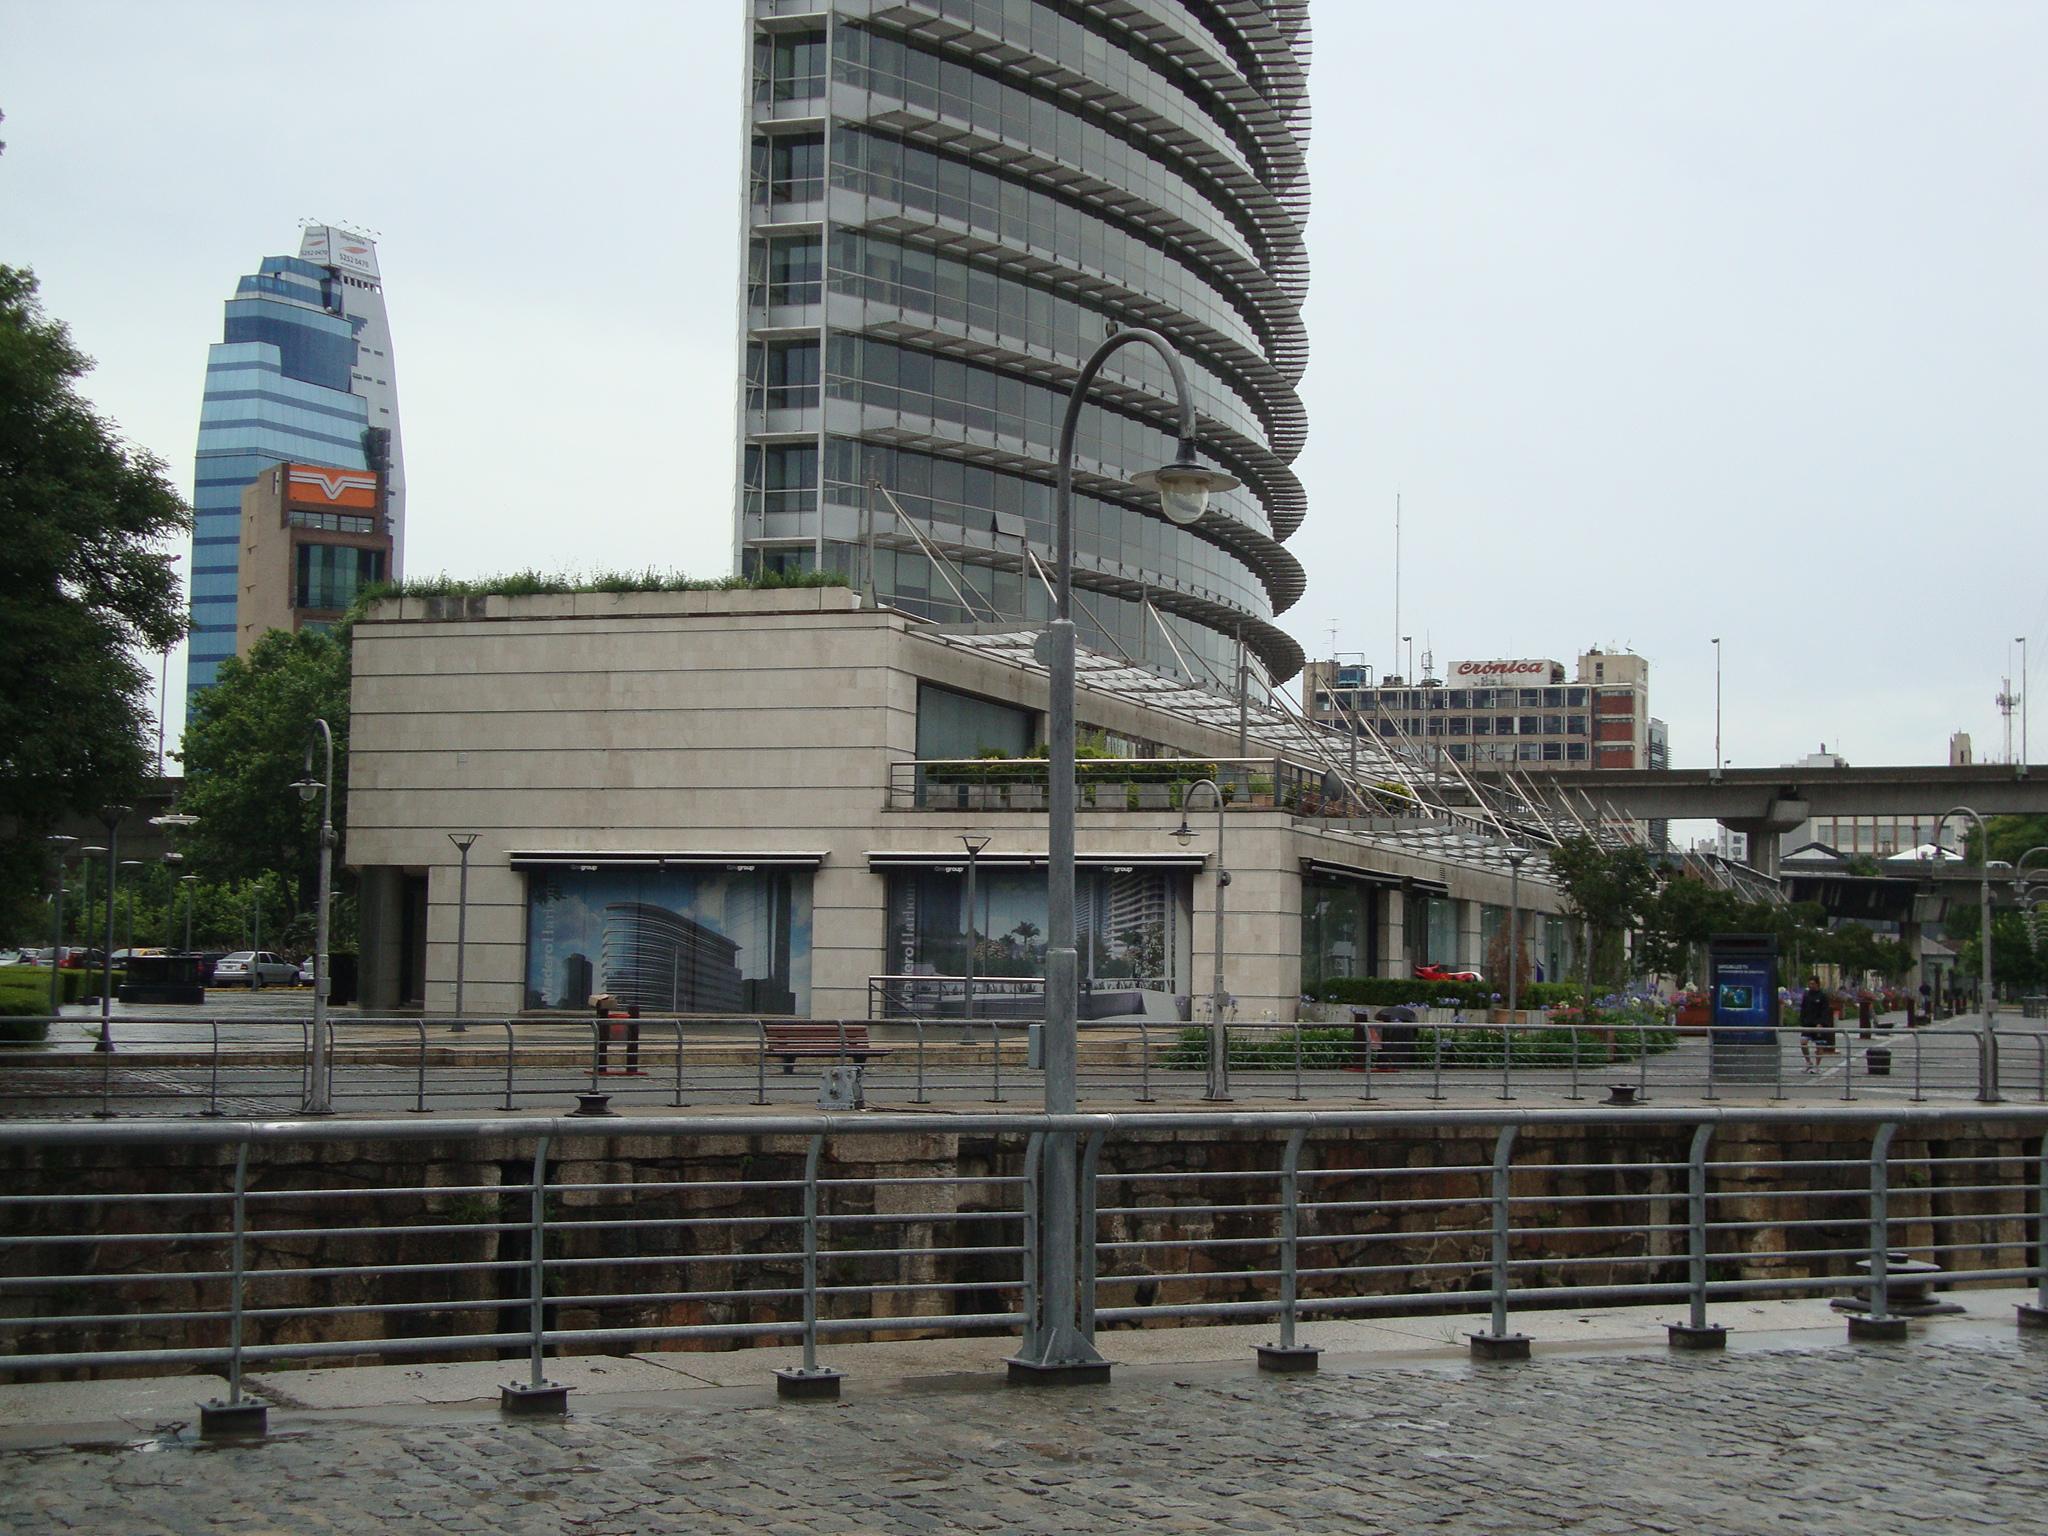 File:Edificio Malecón Basamento.JPG - Wikimedia Commons